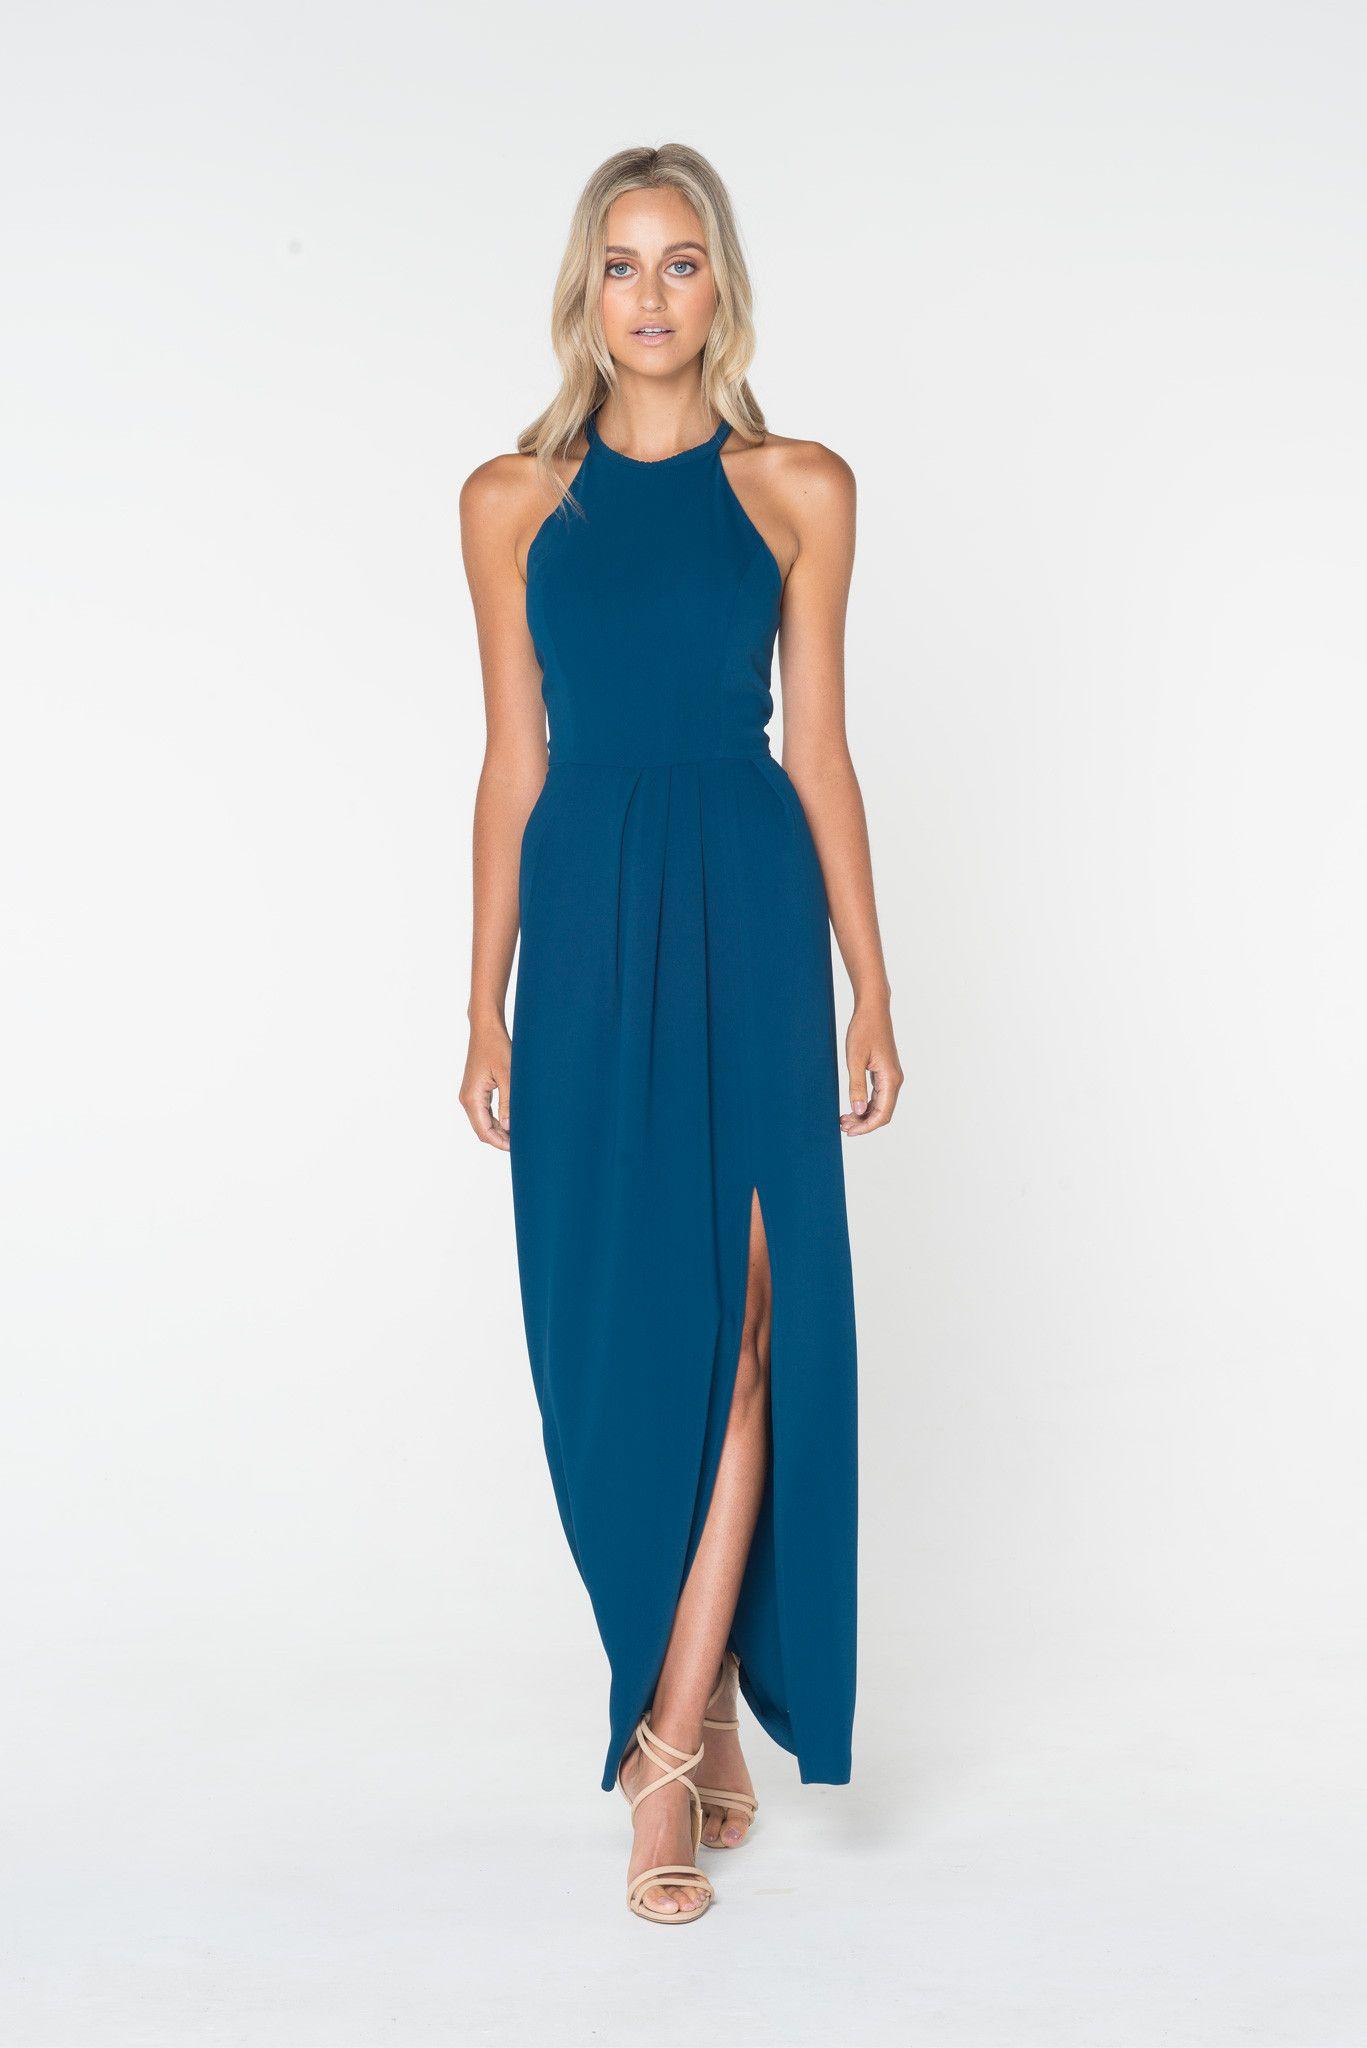 Womens Formal Dresses Online - Shop Formal Dresses | Pilgrim ...